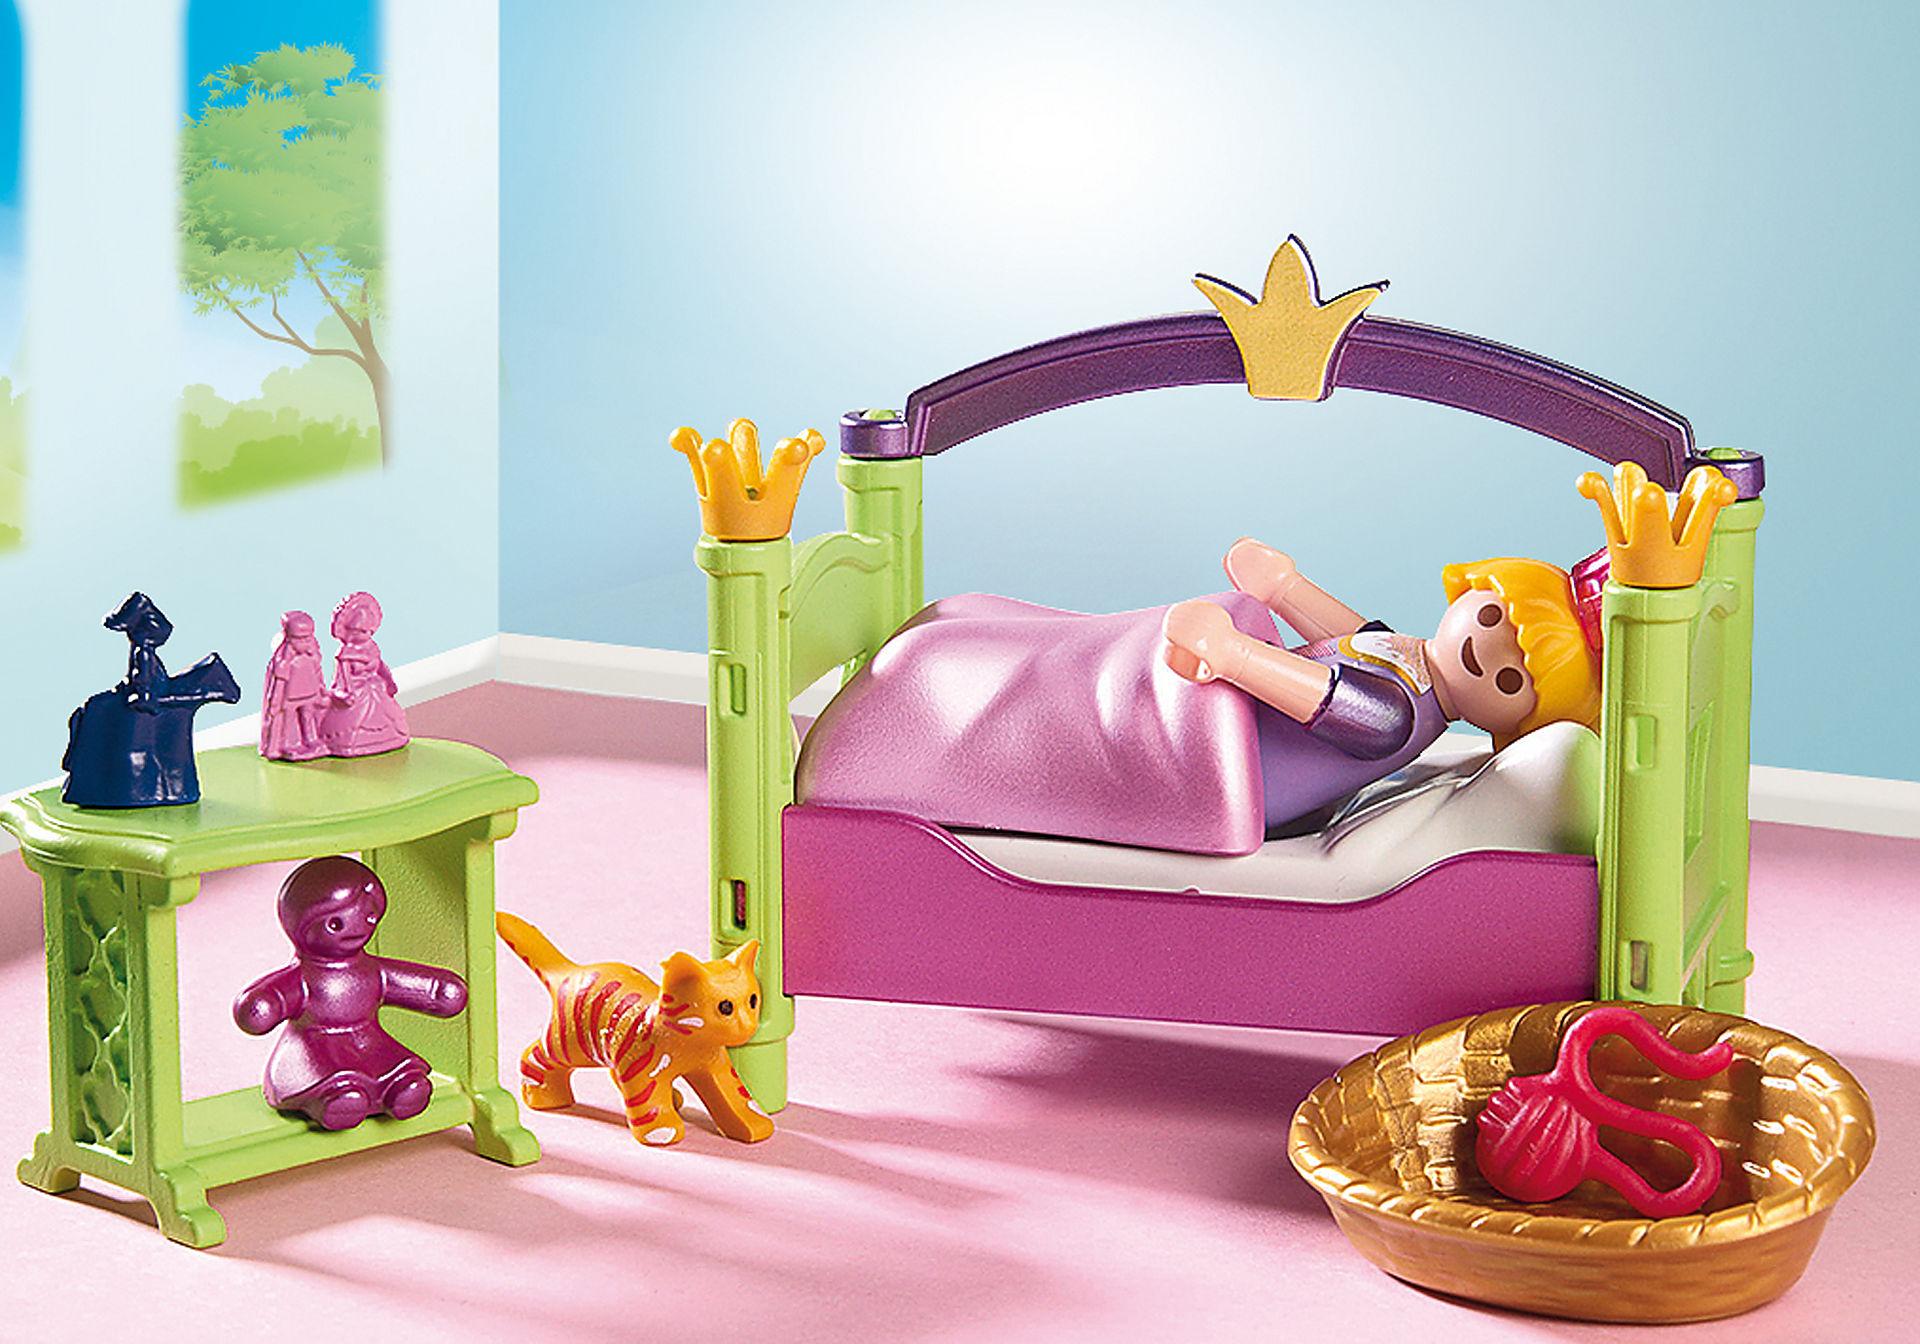 http://media.playmobil.com/i/playmobil/6852_product_extra1/Замок Принцессы: Королевская няня